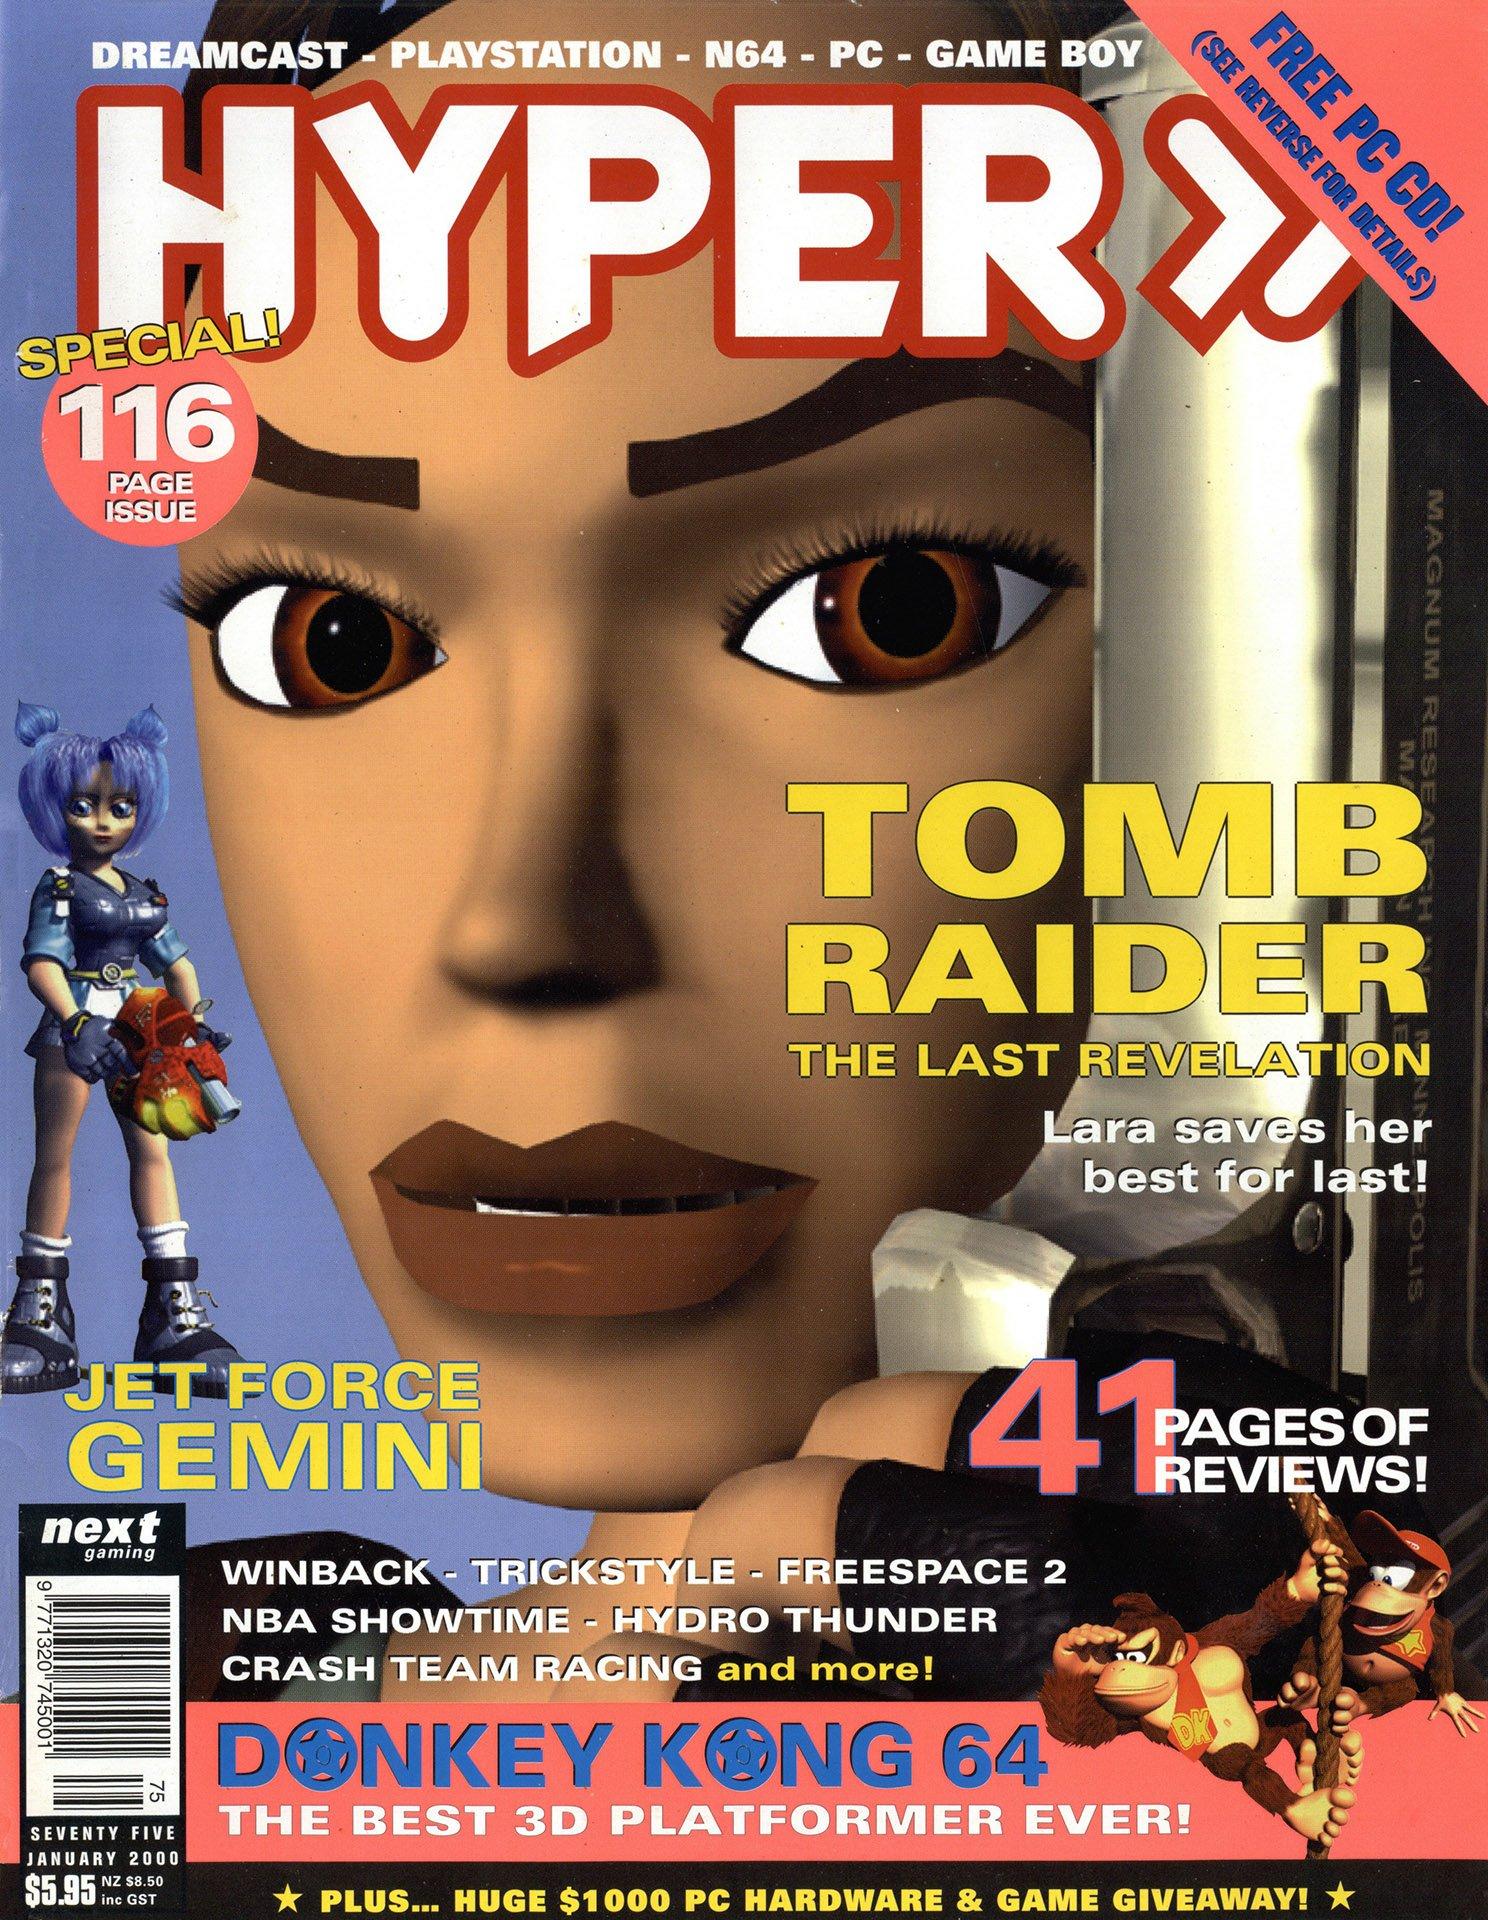 Hyper 075 (January 2000)